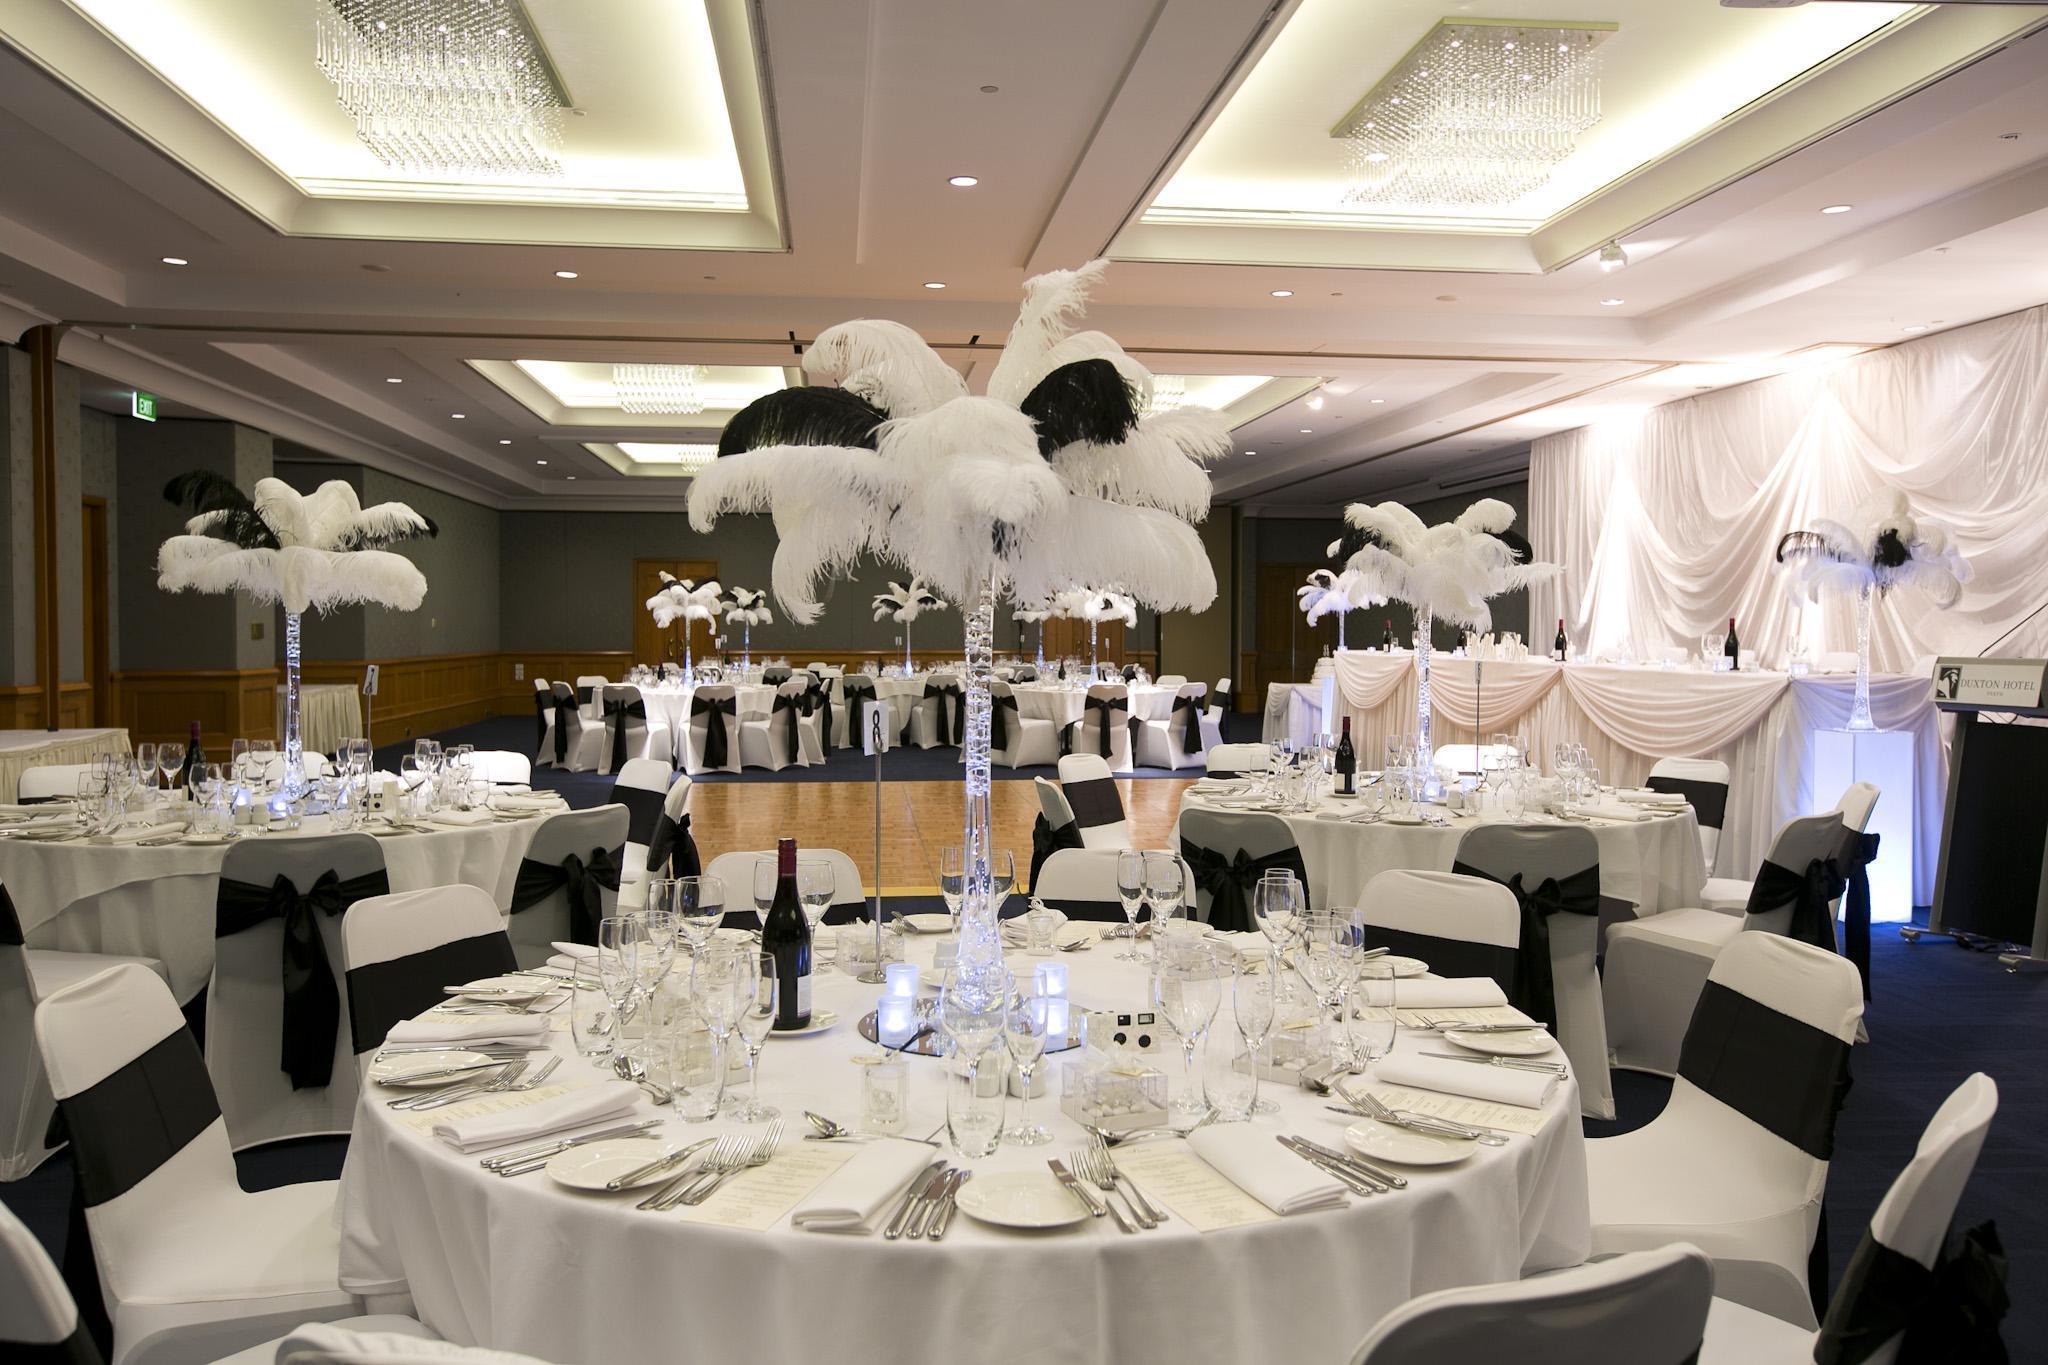 album609_1370328847_103_Ballroom_wedding_feathers